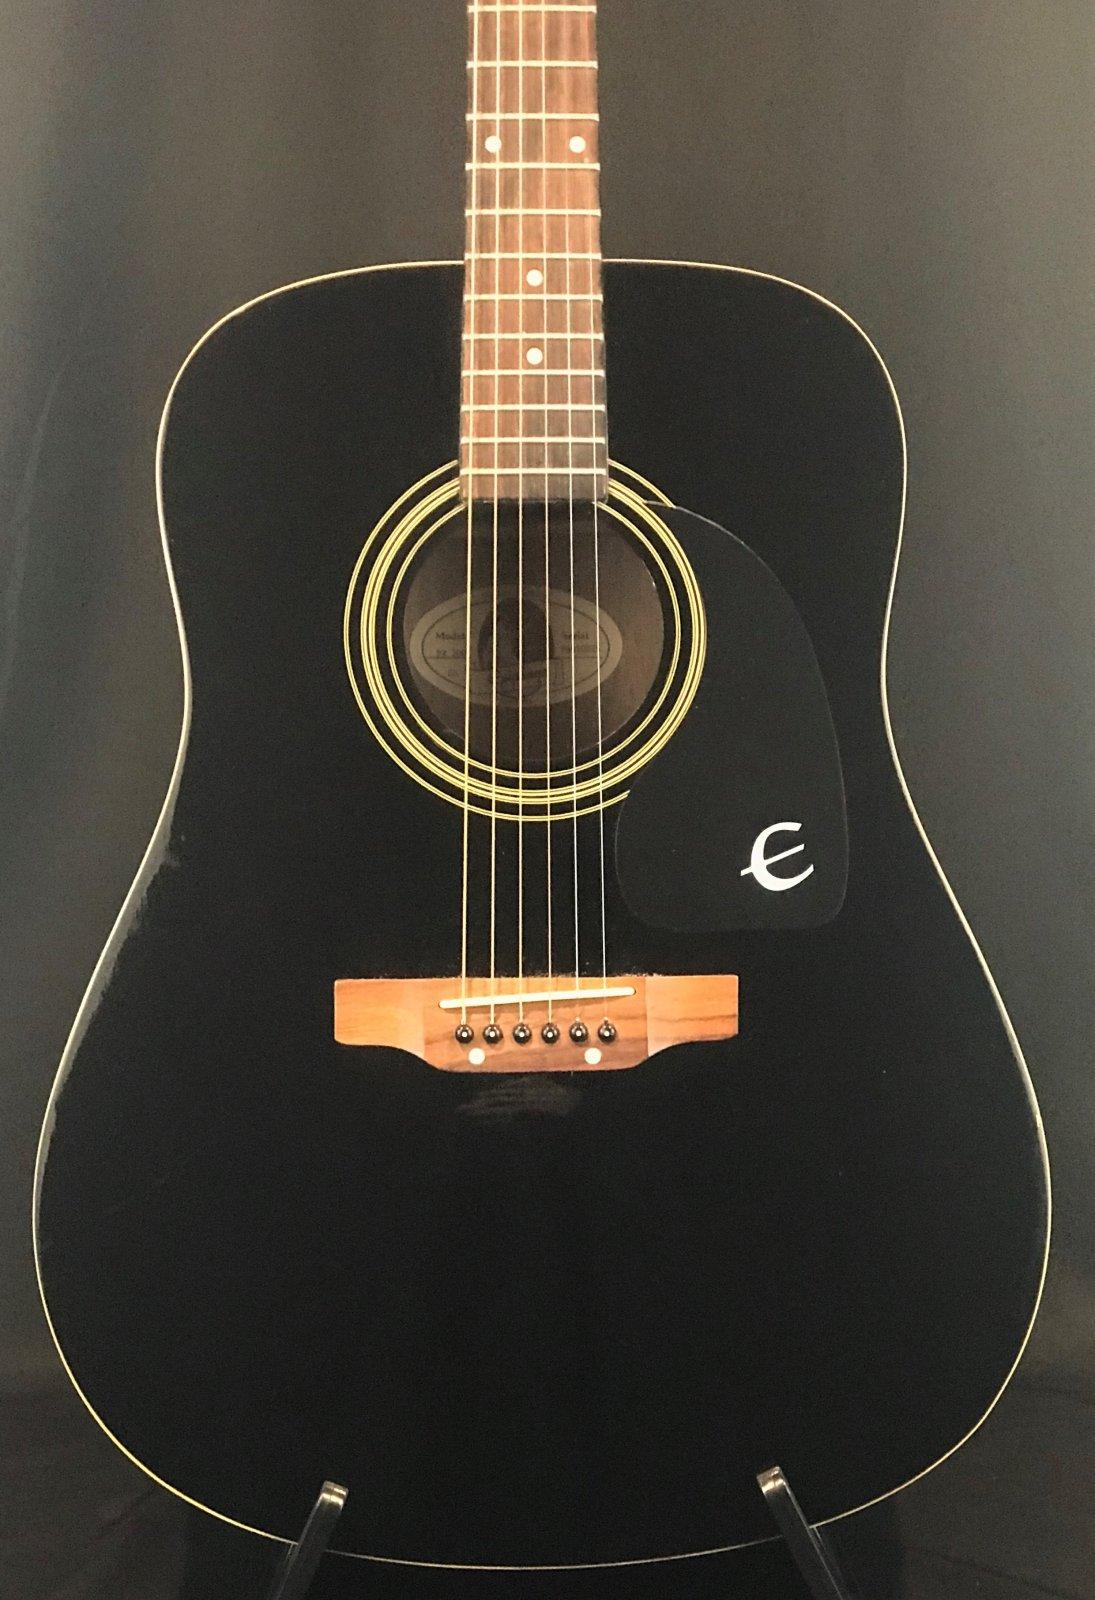 Used Epiphone PR200 EB Acoustic Guitar in Black